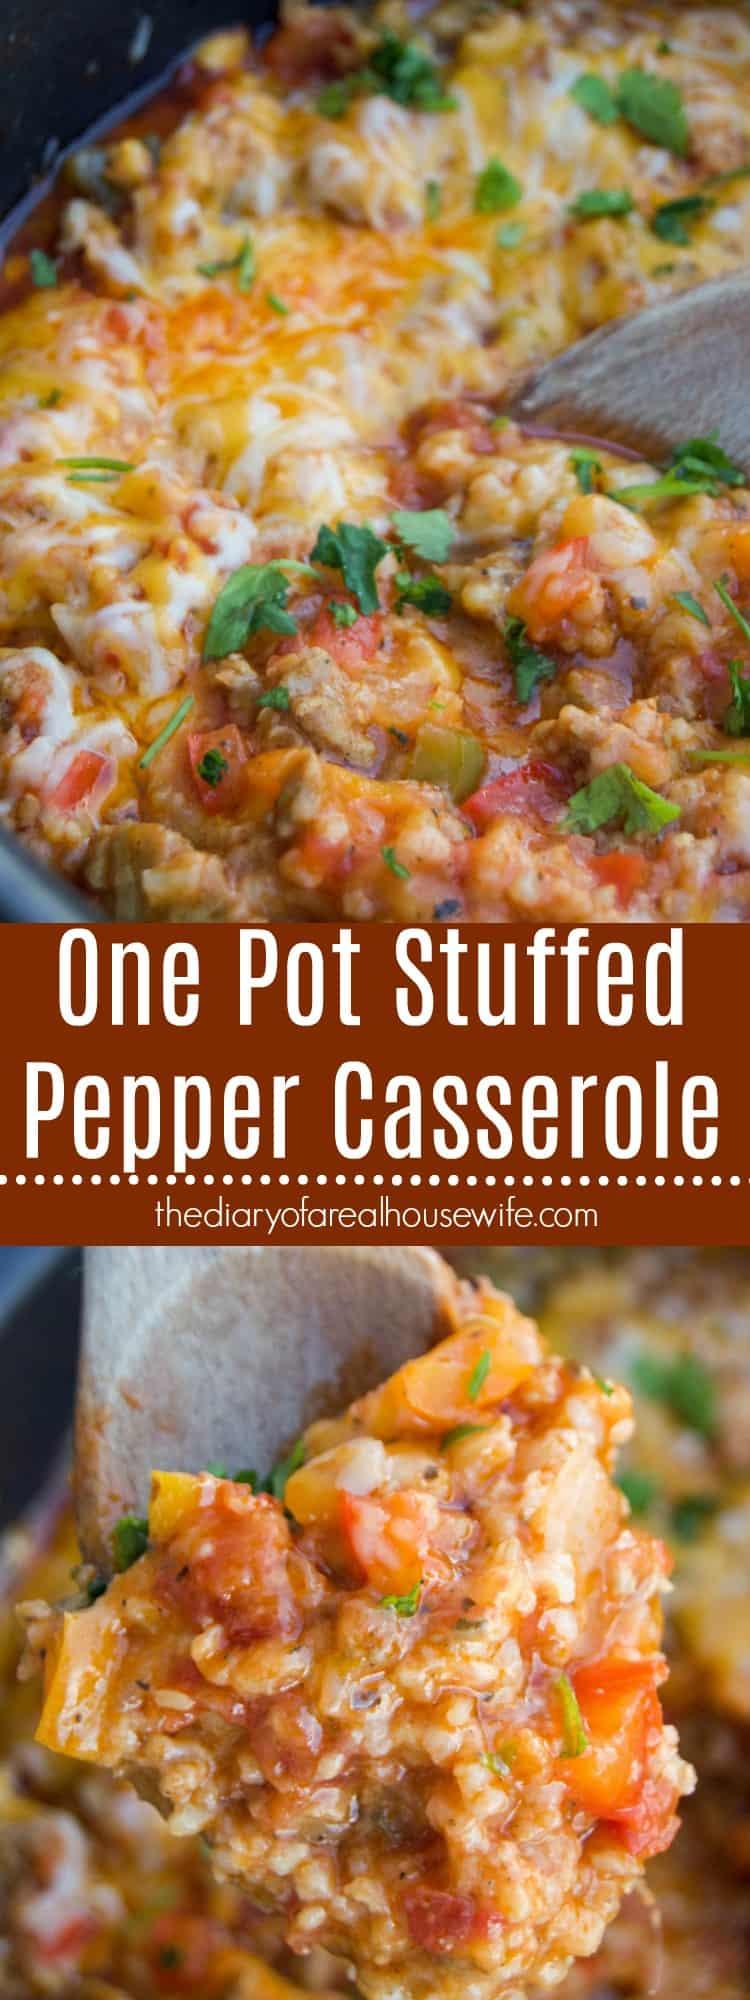 One Pot Stuffed Pepper Casserole